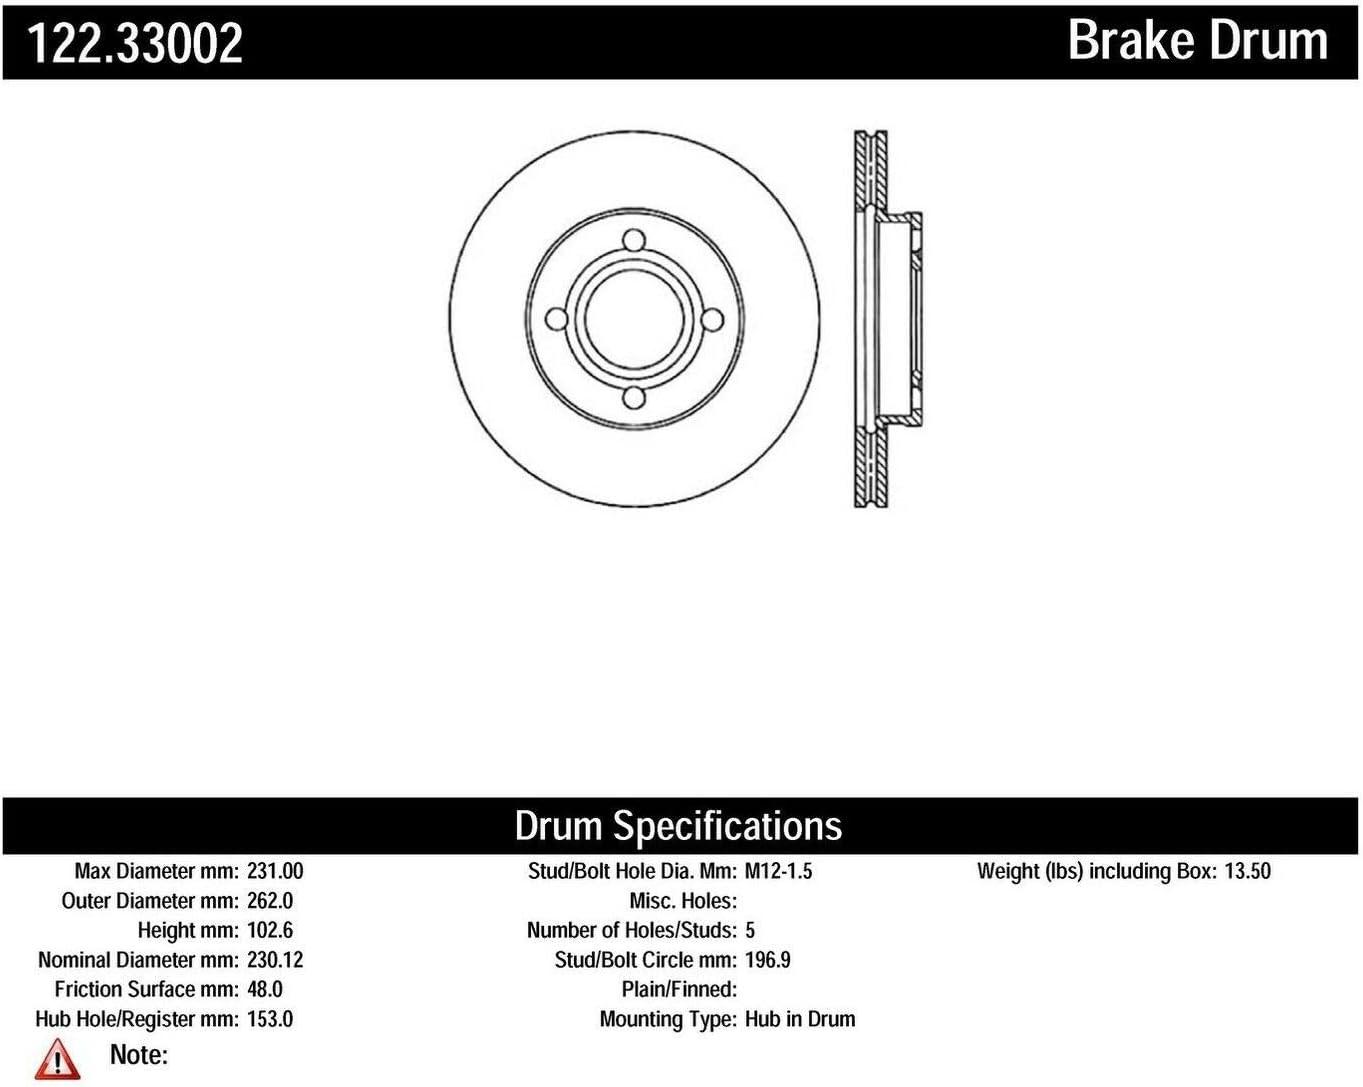 Centric Parts 122.33002 Brake Drum